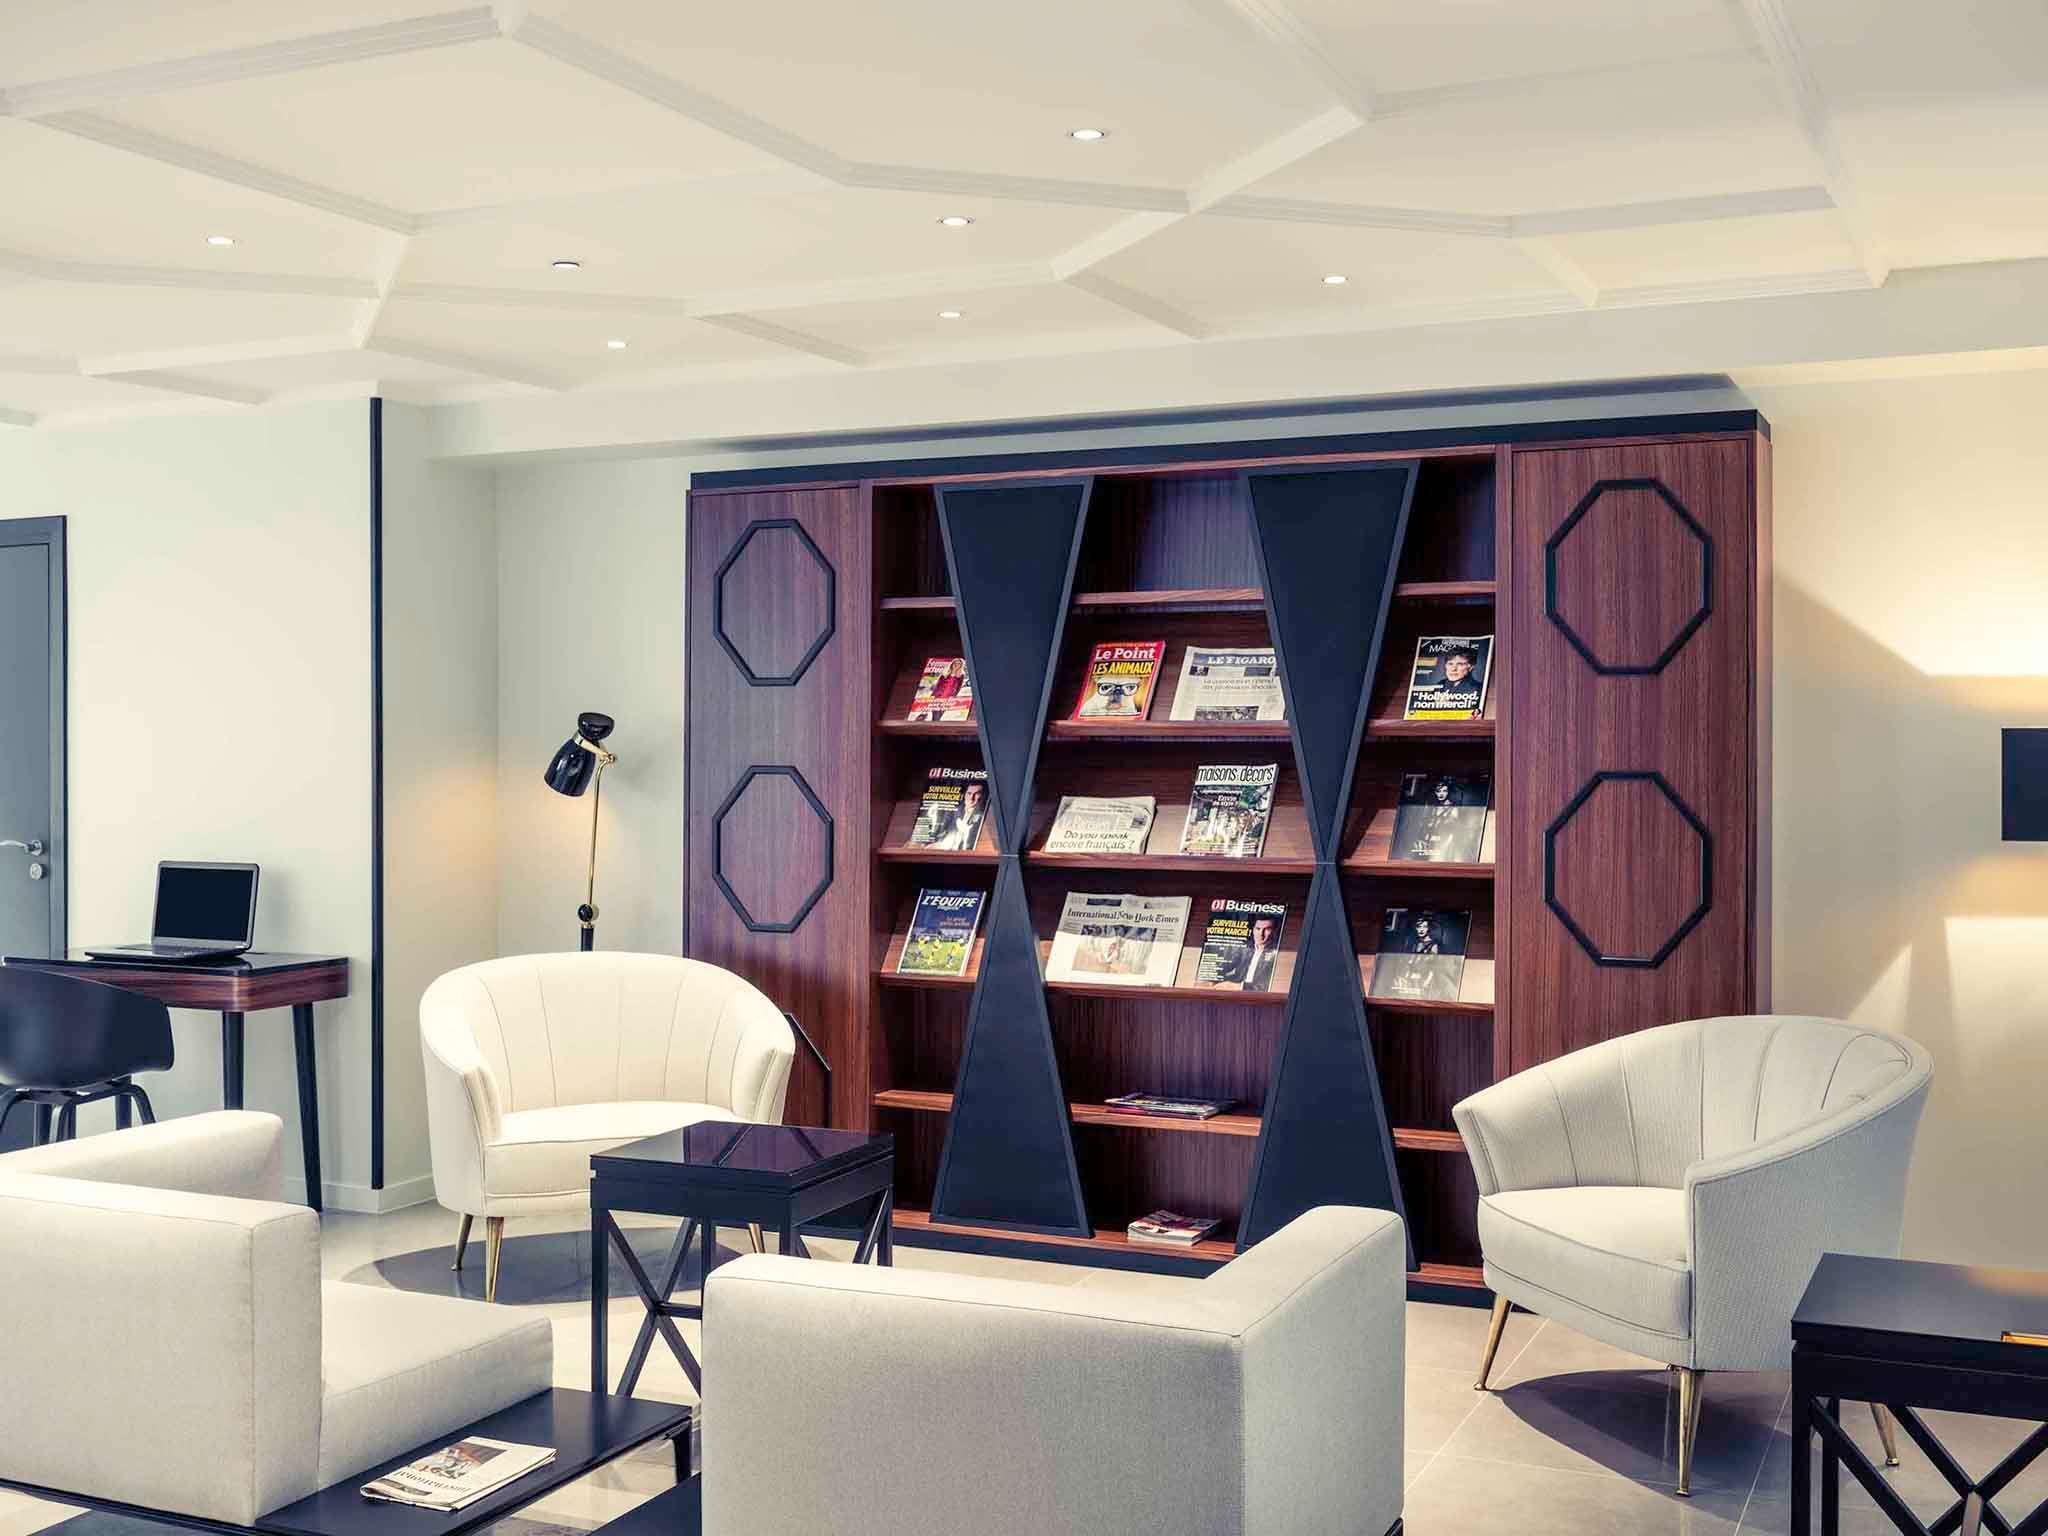 Hotel – Hotel Mercure Parijs Arc de Triomphe Wagram